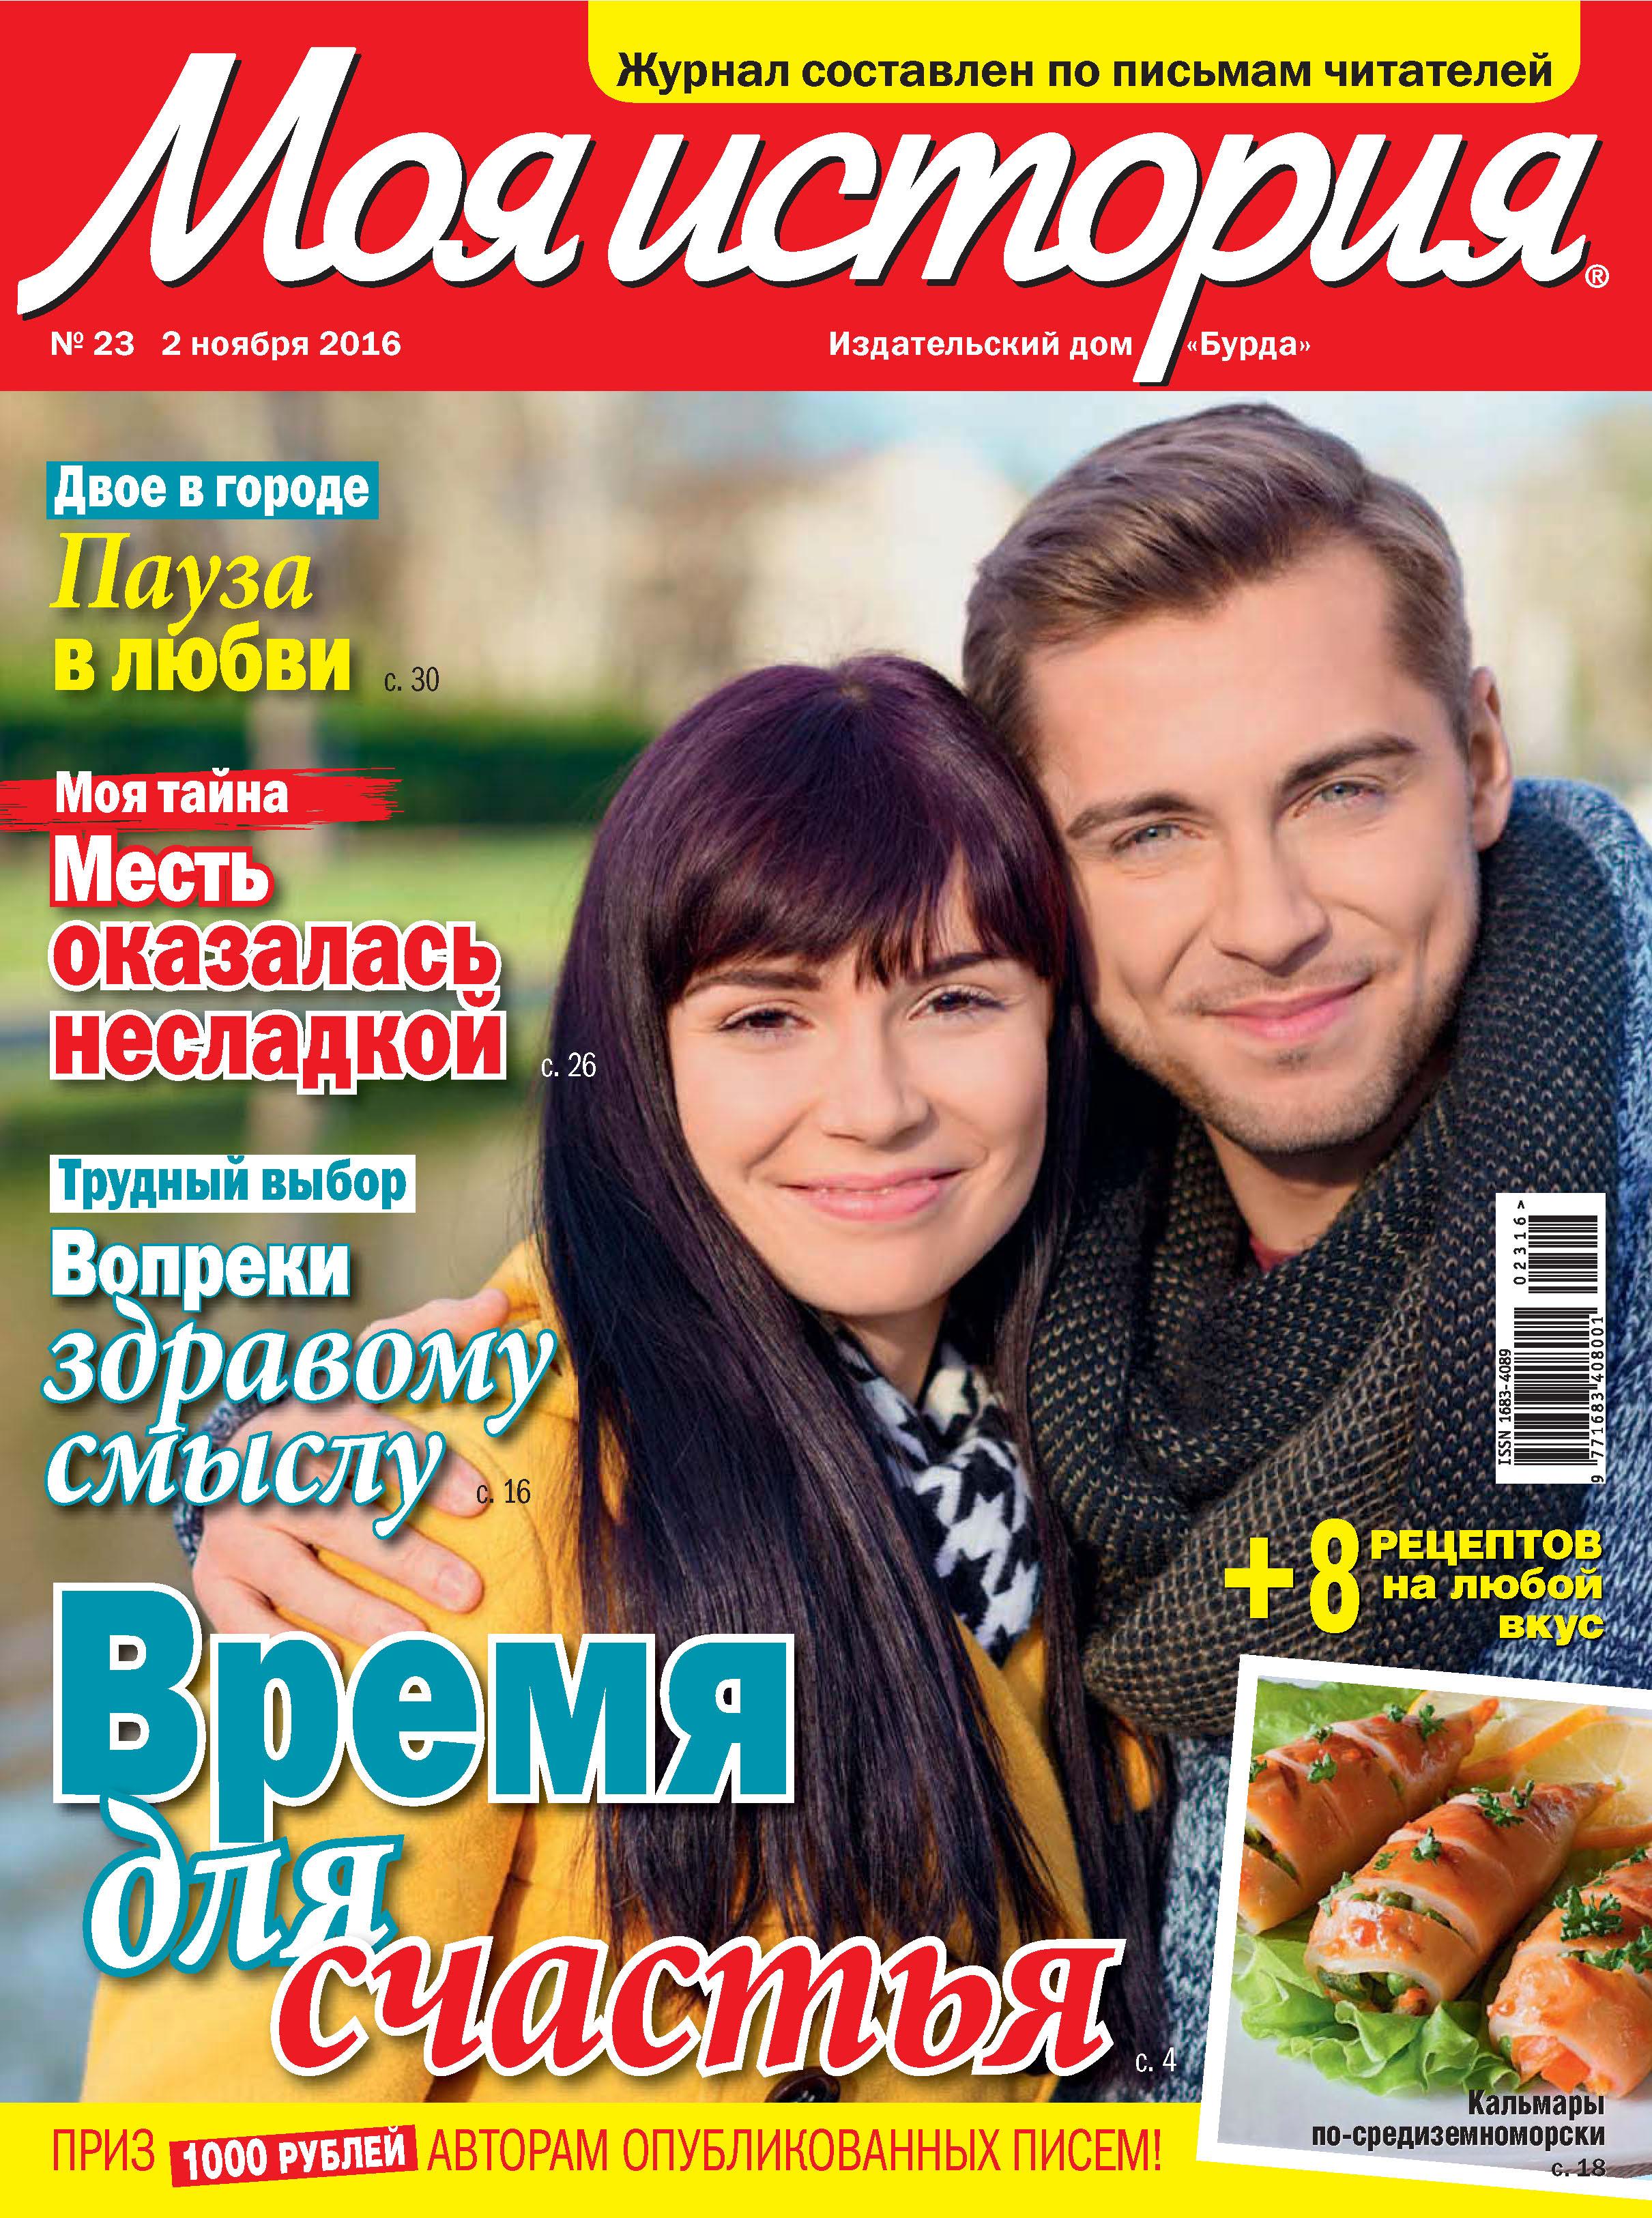 ИД «Бурда» Журнал «Моя история» №23/2016 ид бурда журнал моя история 14 2016